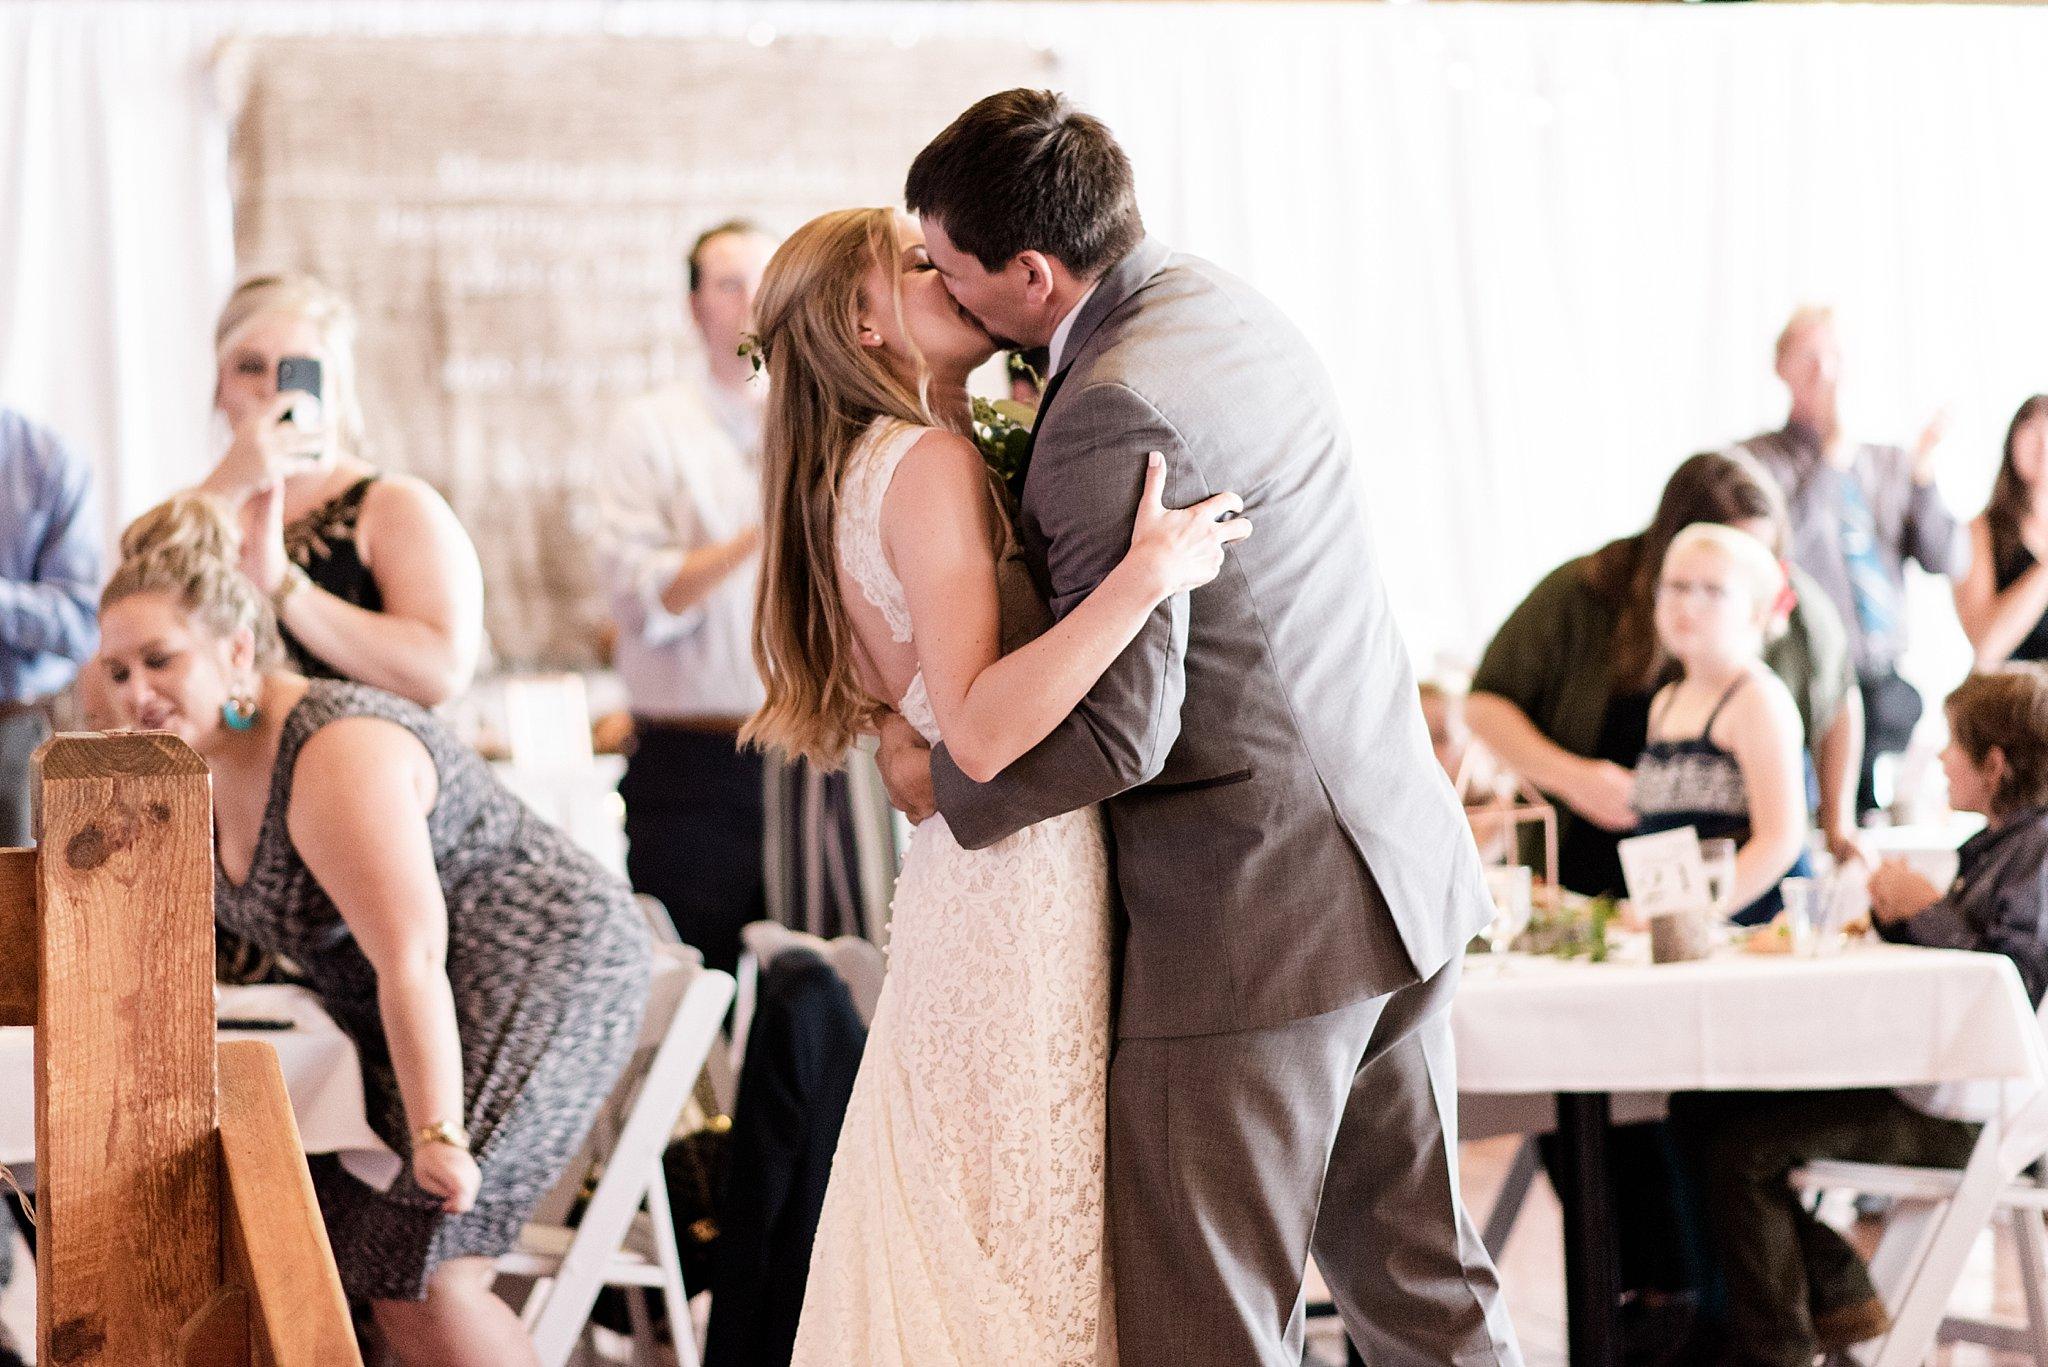 Cadillac-Michigan-wedding-caberfae-peaks-milwaukee-photographer_0075.jpg